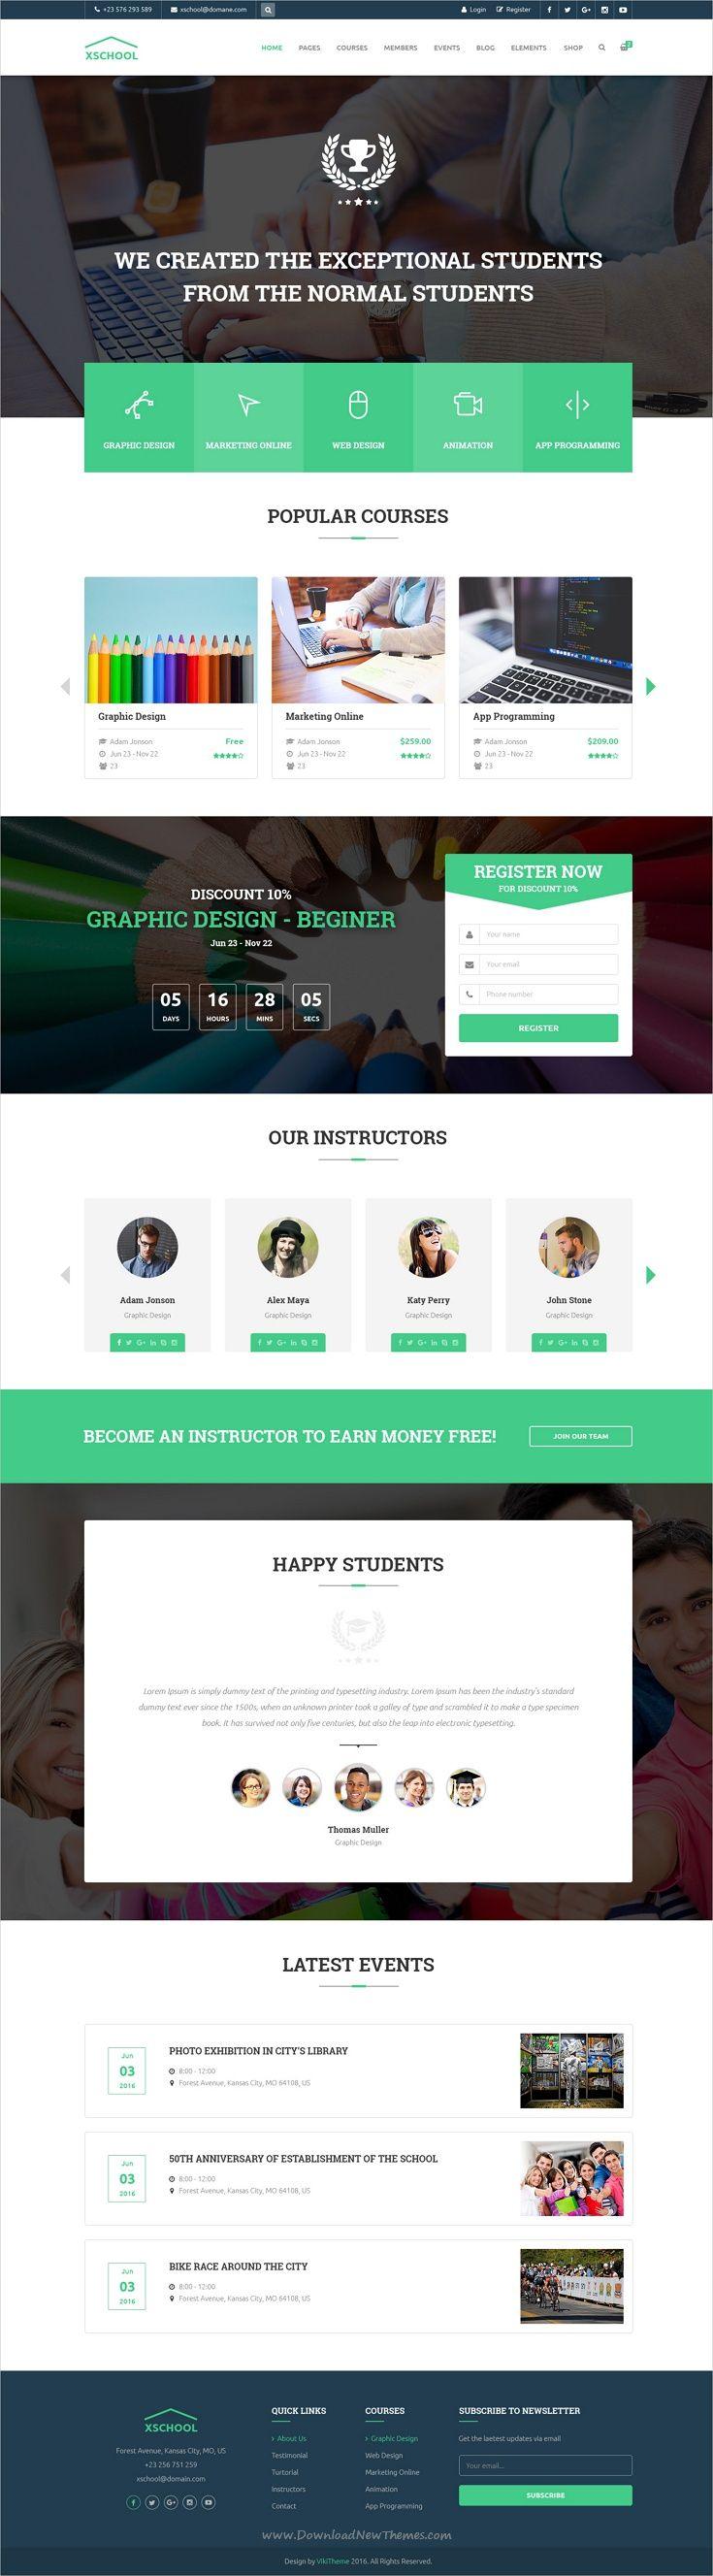 Xshool School Education Psd Template Corporate Website Design Web Design Quotes Web Design